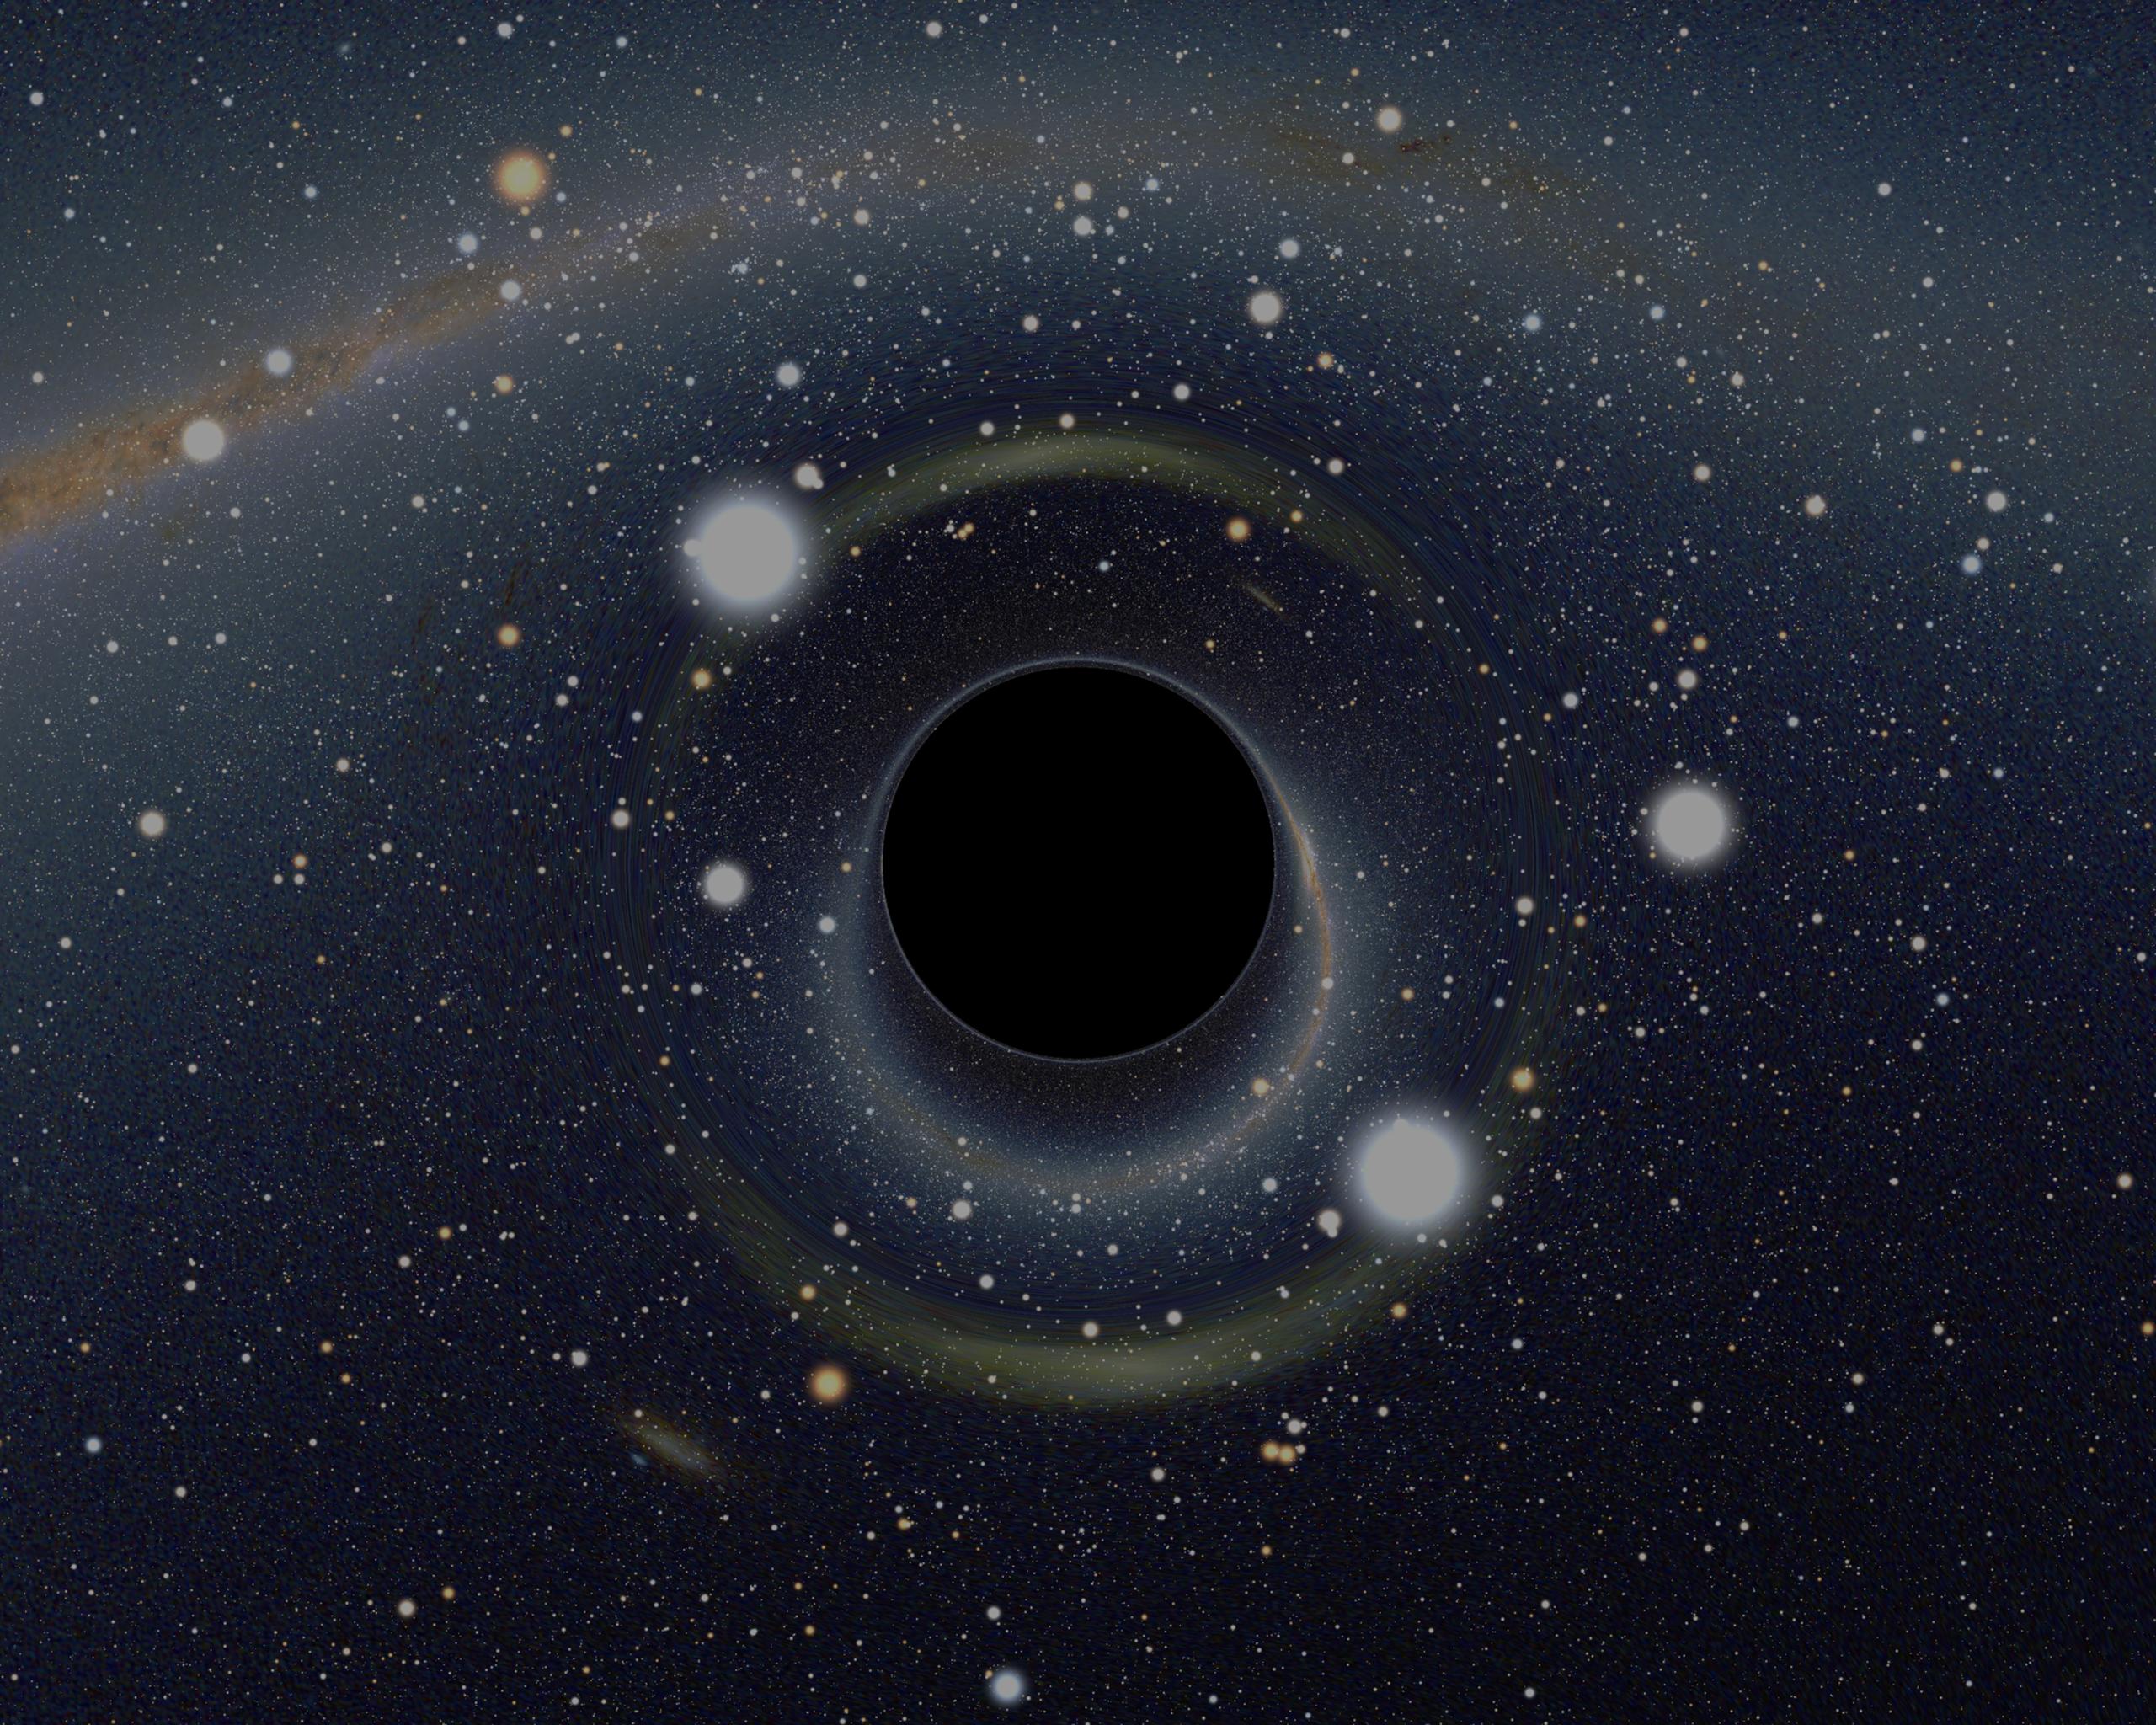 Area 699 – The Black Hole of Listings